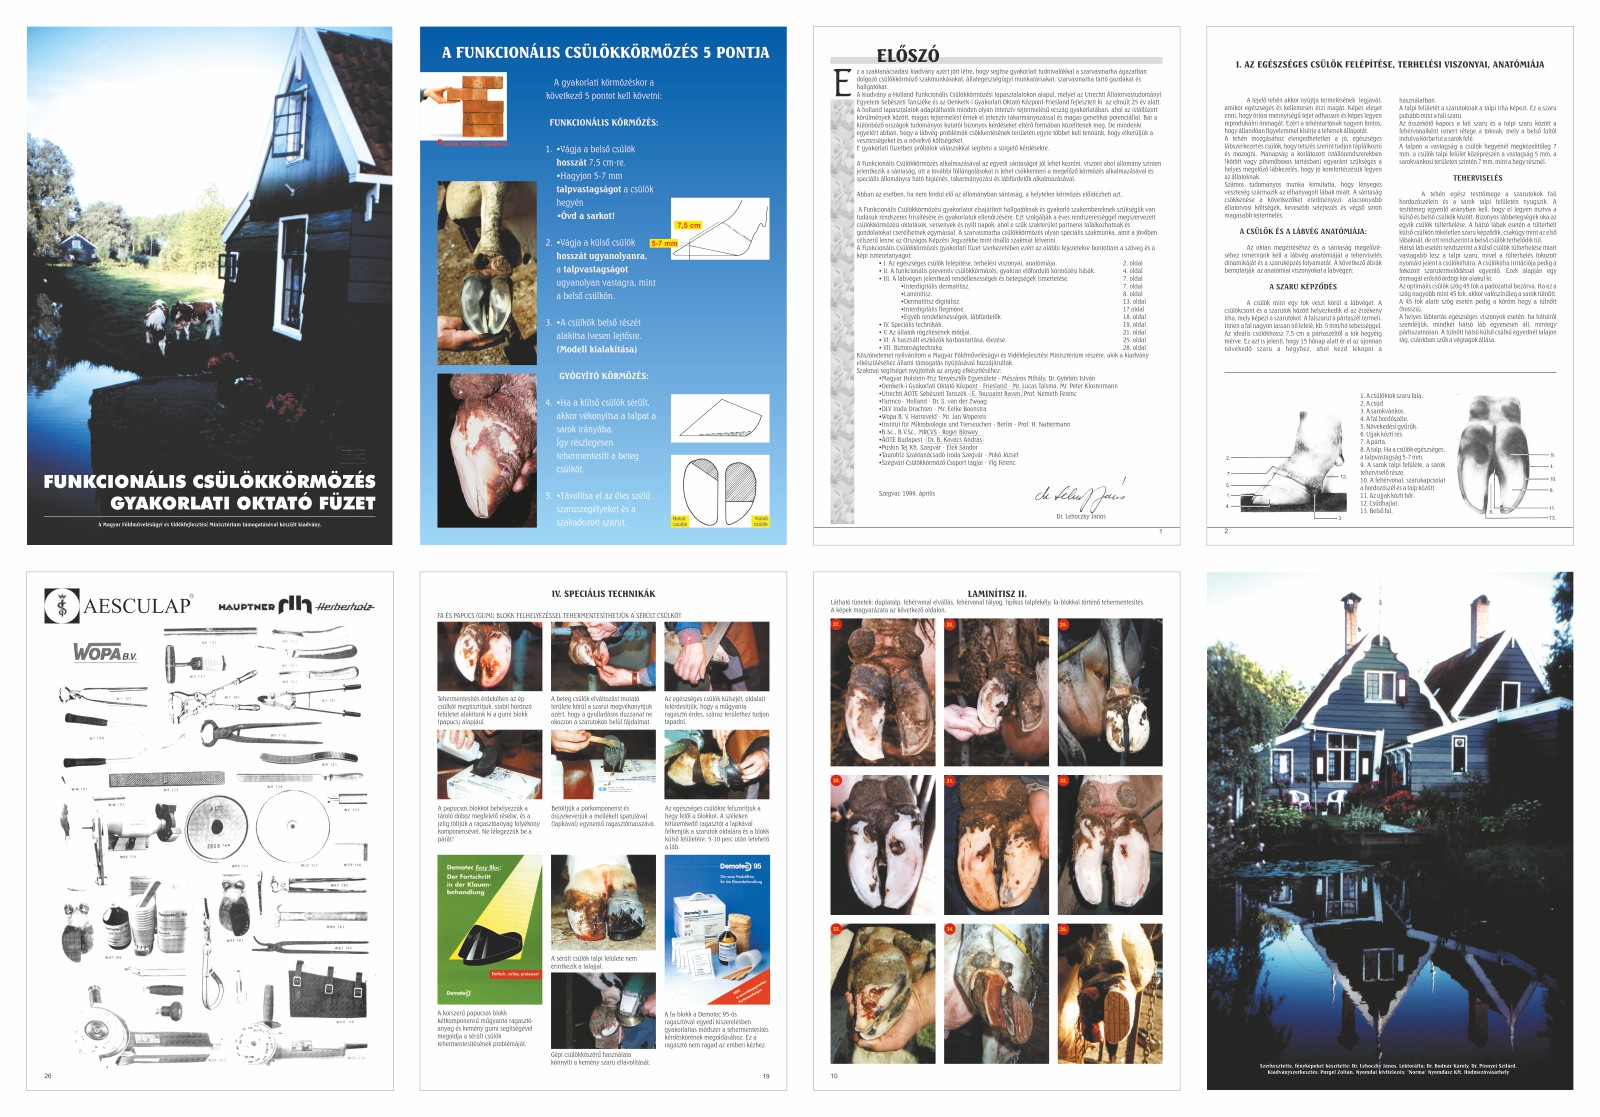 001-FunkcionalisCsulokkormozesGyakorlatiOktatoFuzet-1999